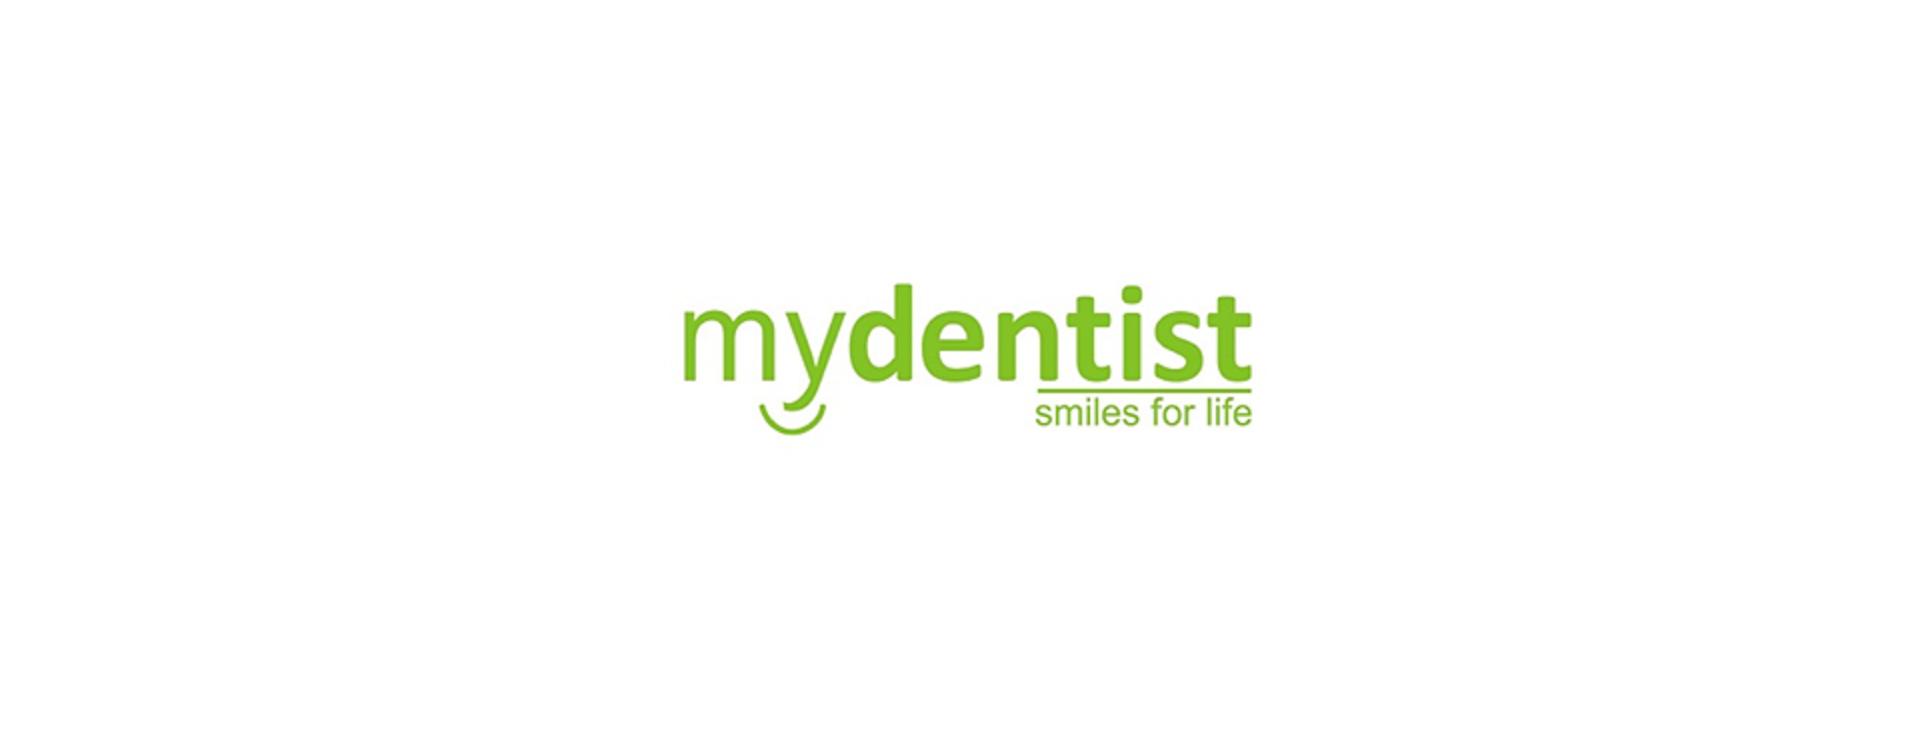 Mydentist front